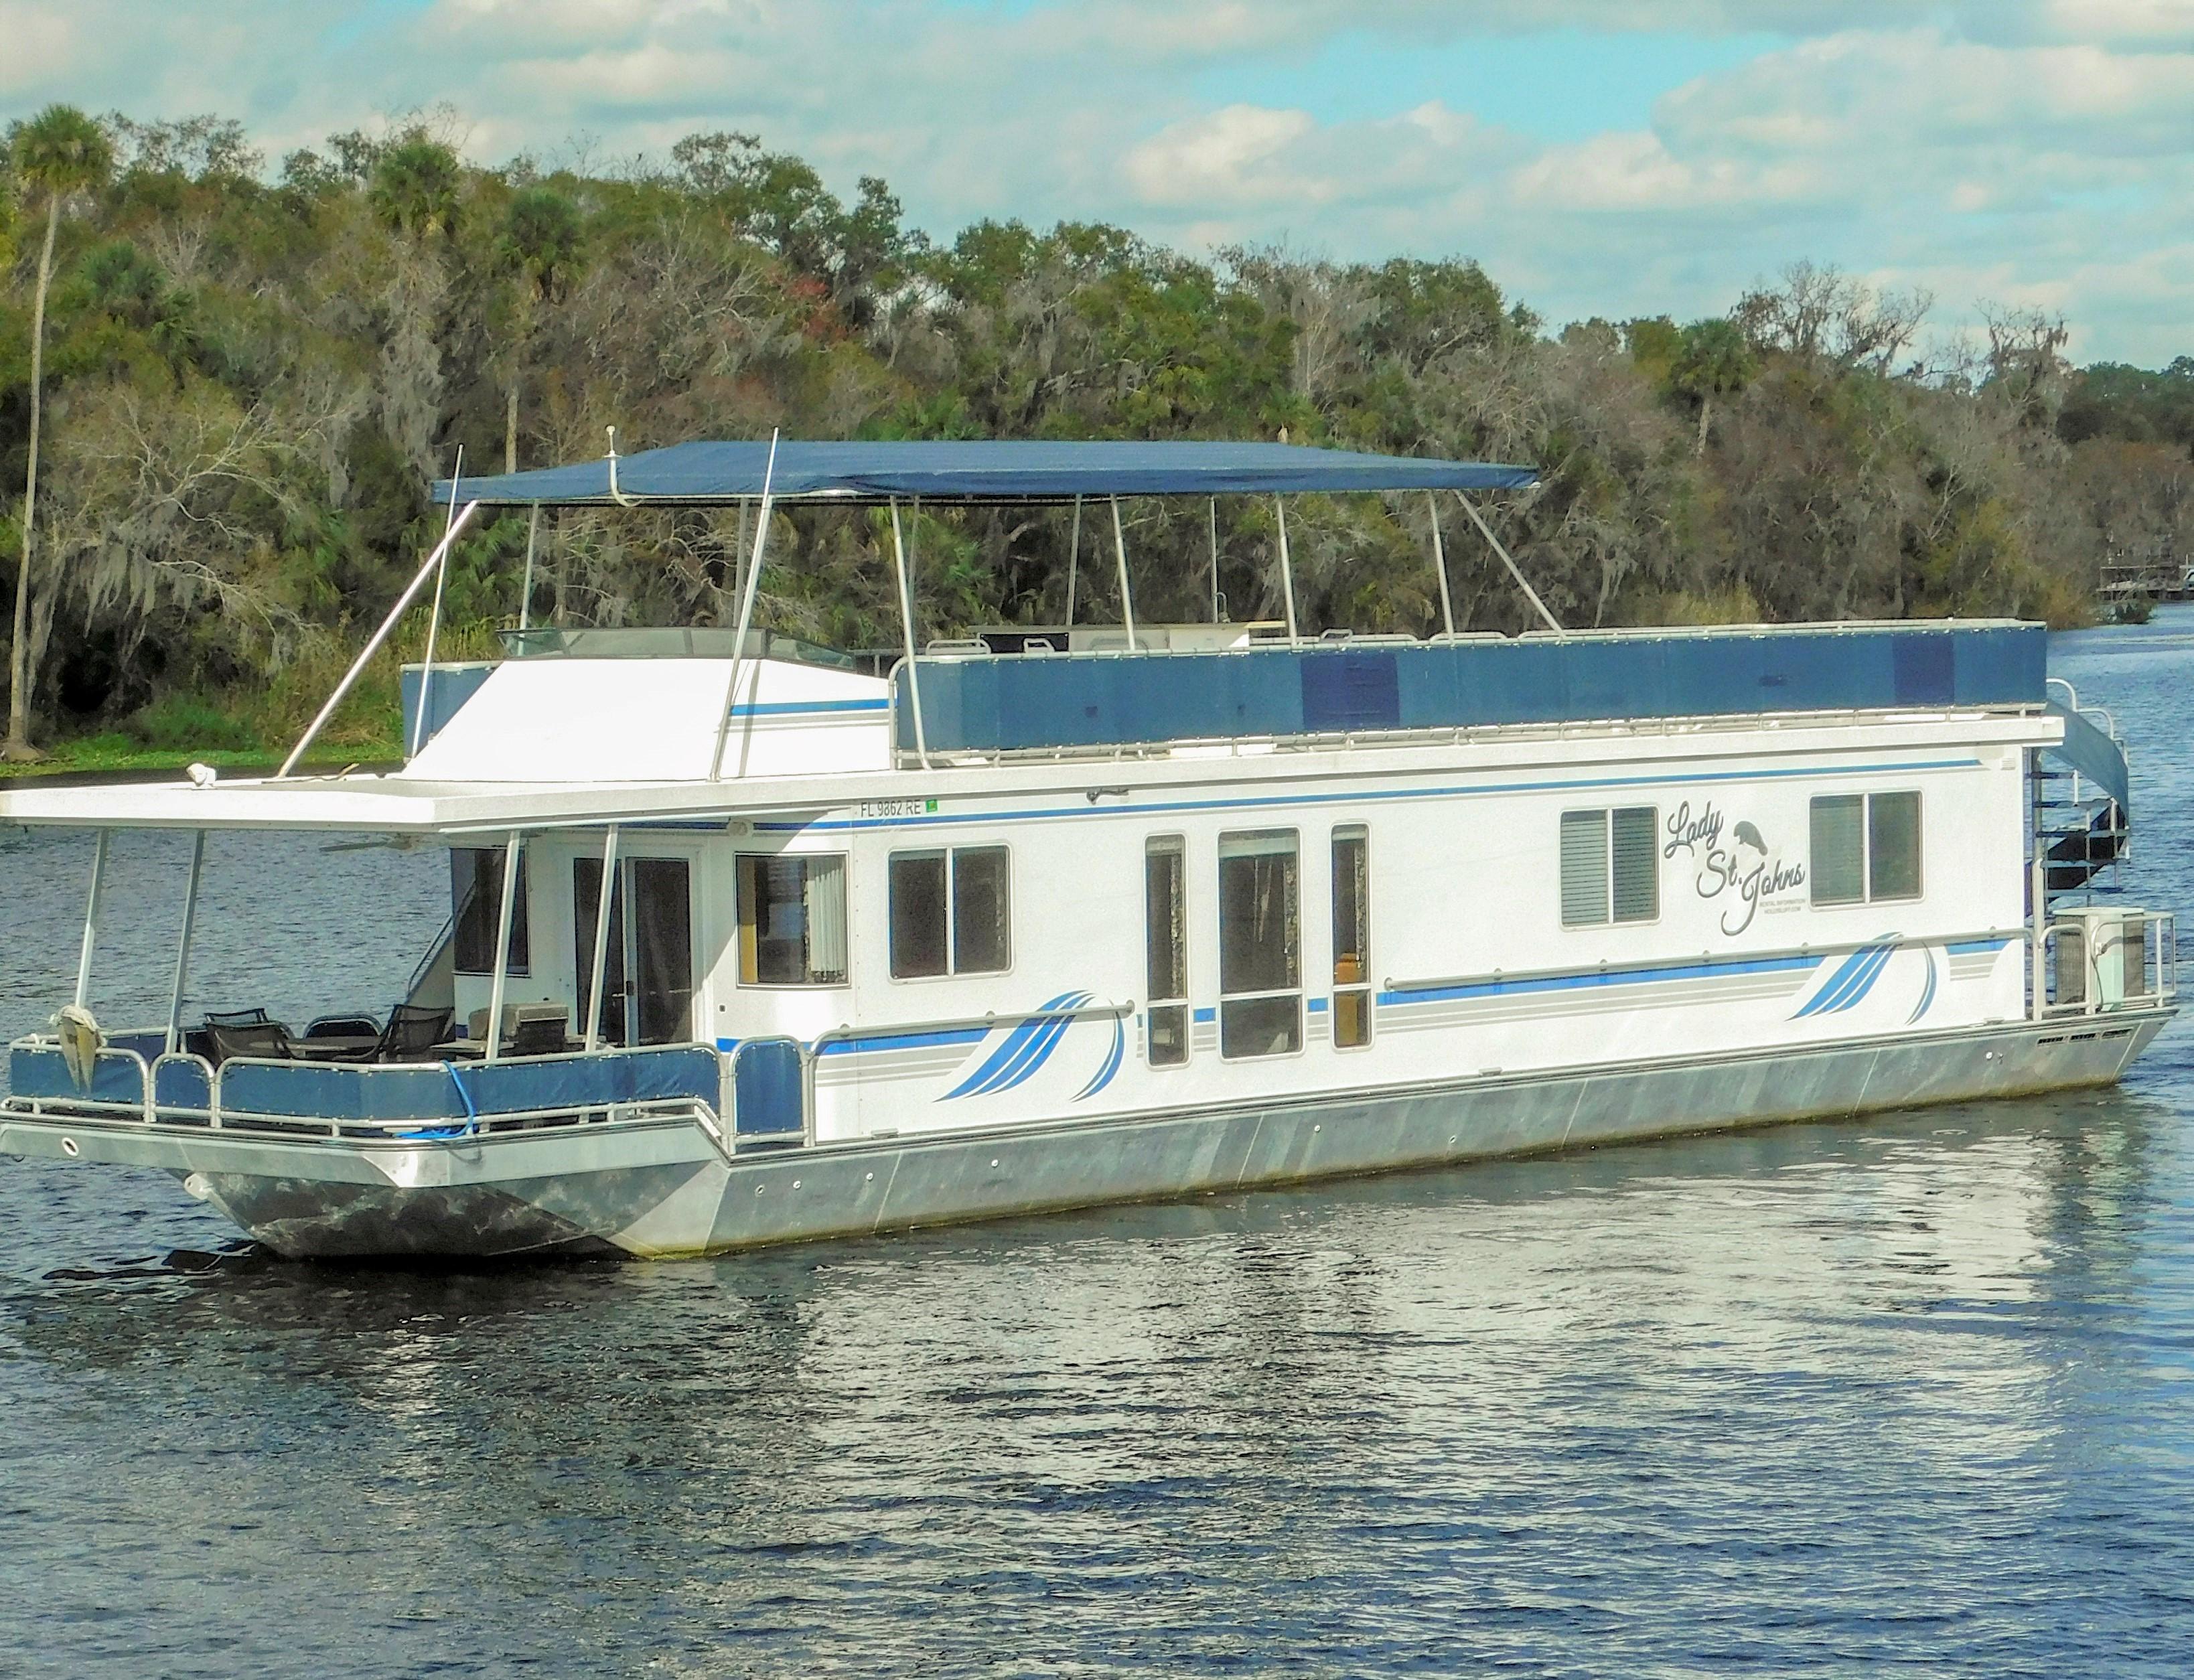 6′ 6 Sleeper Executive (Lady St. Johns) – Holly Bluff Marina